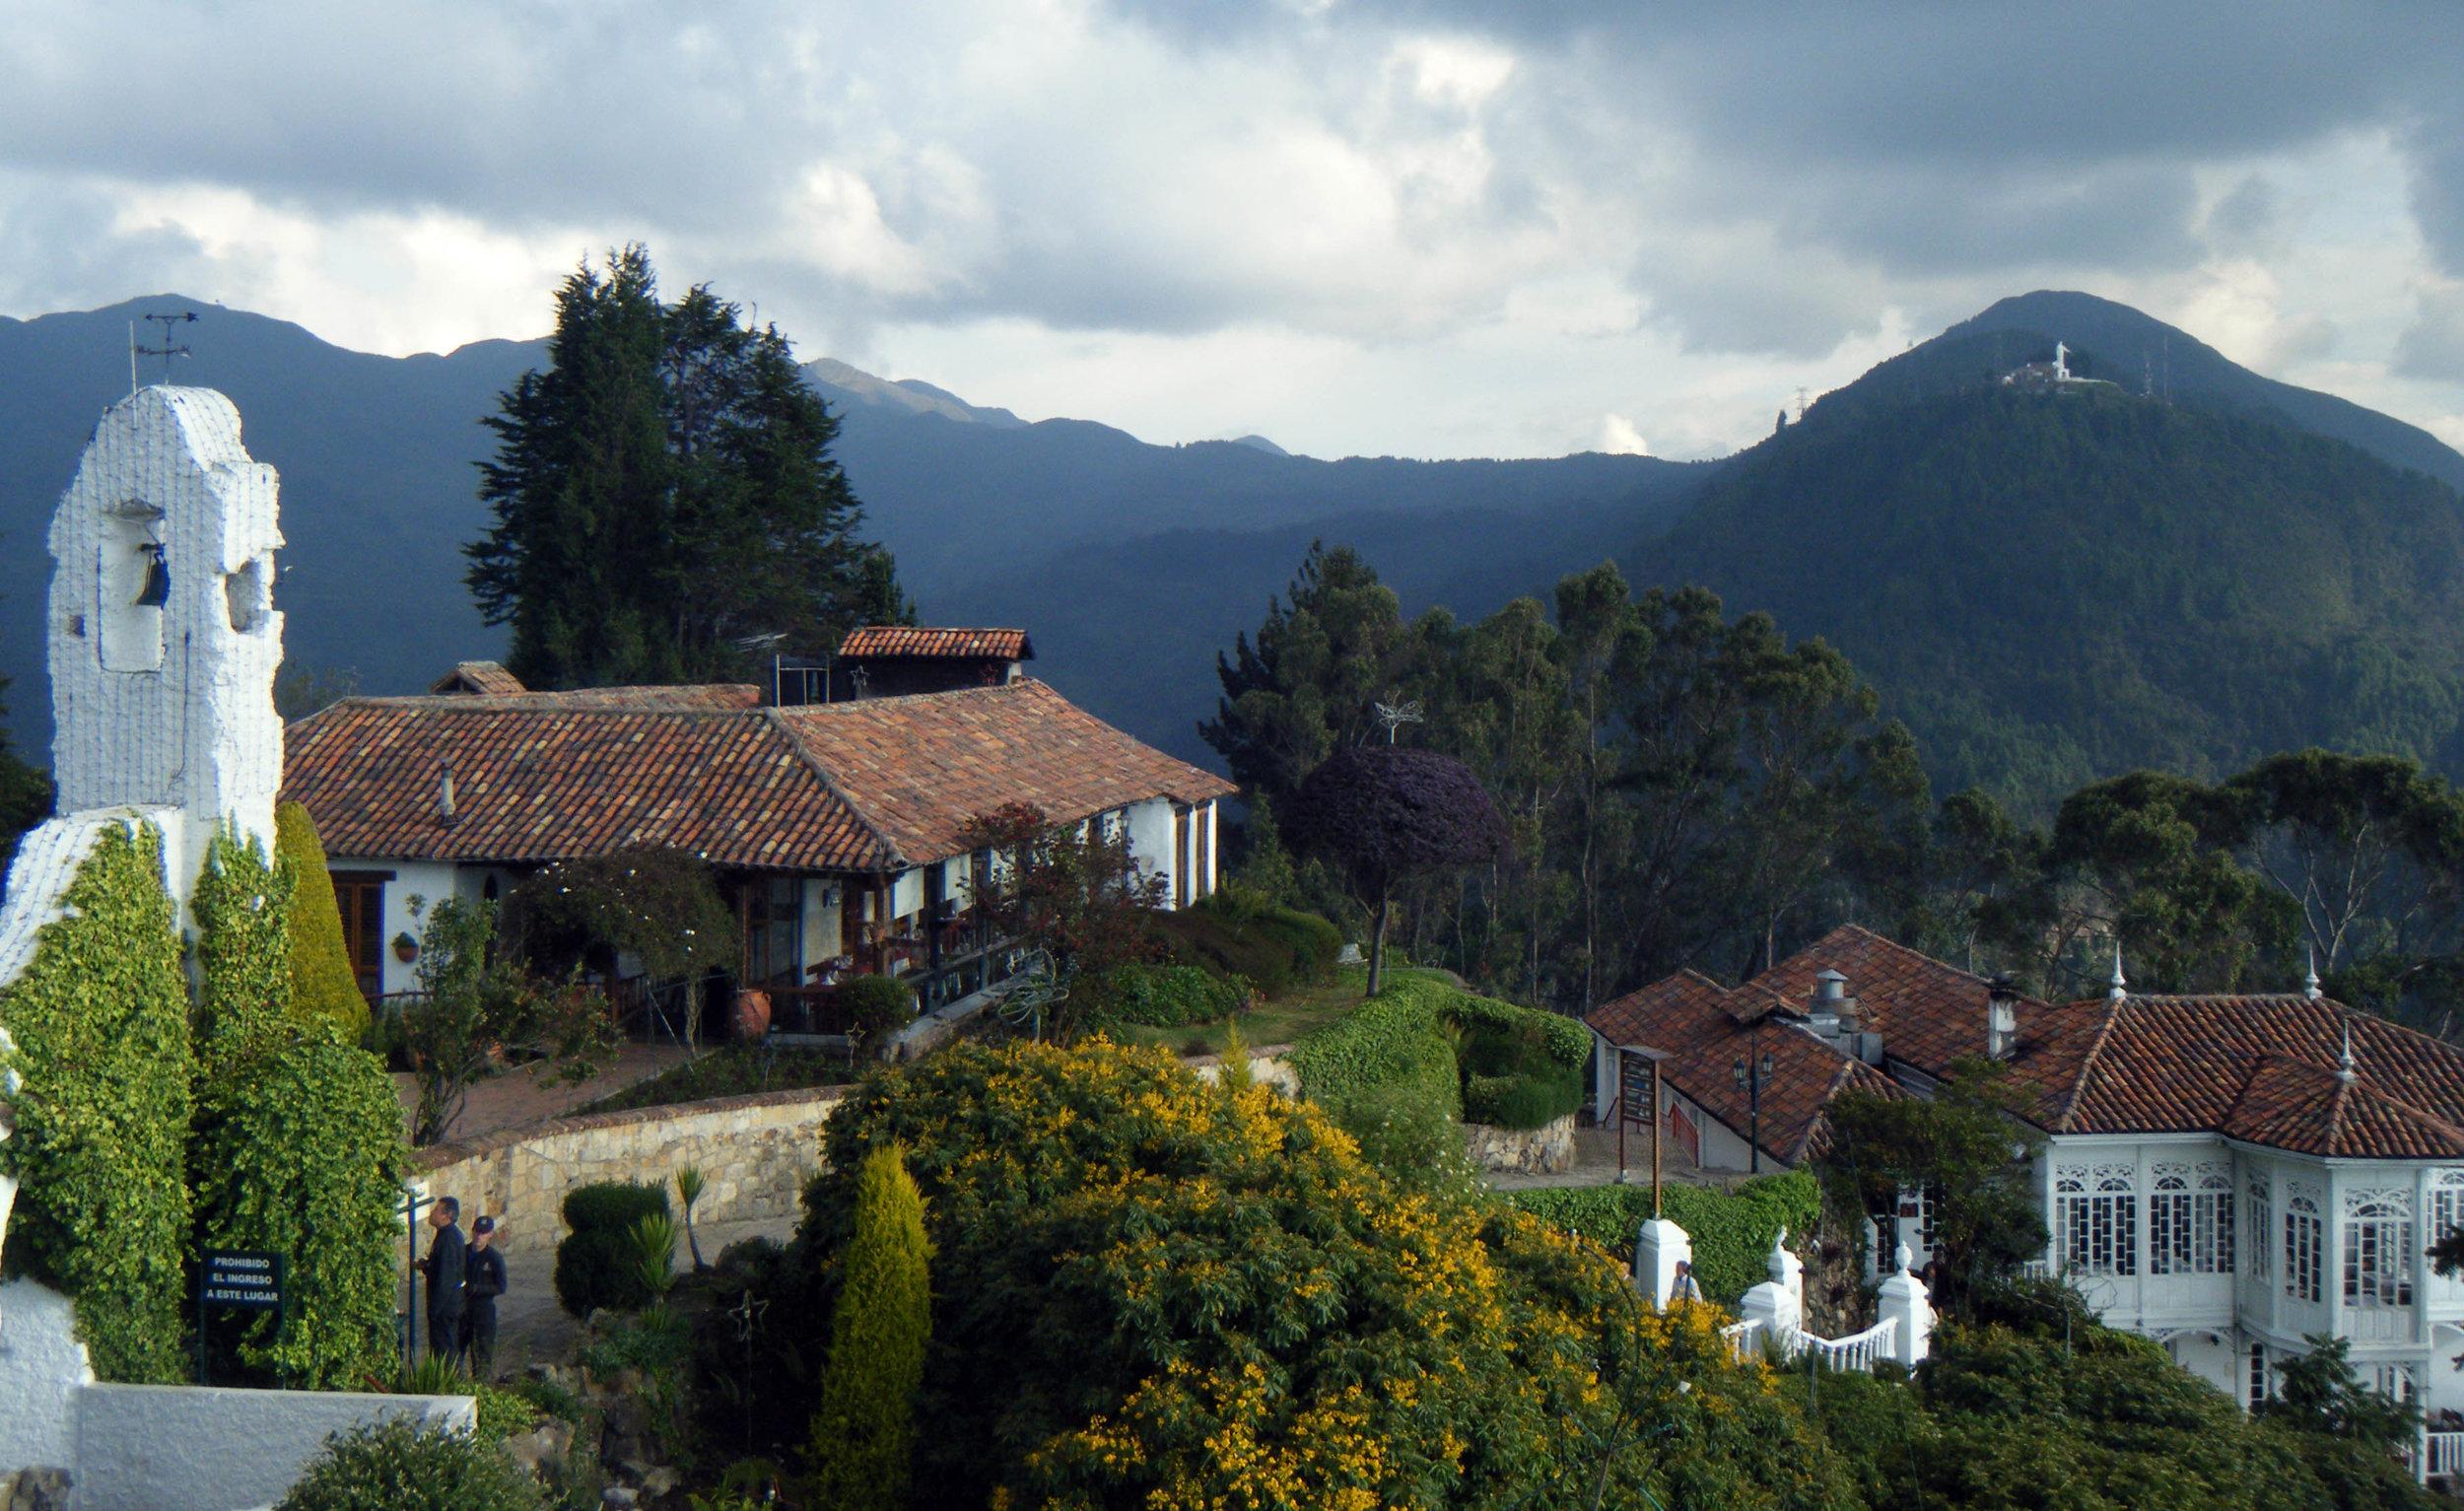 Cerro de Montserrate 10-4-12.jpg